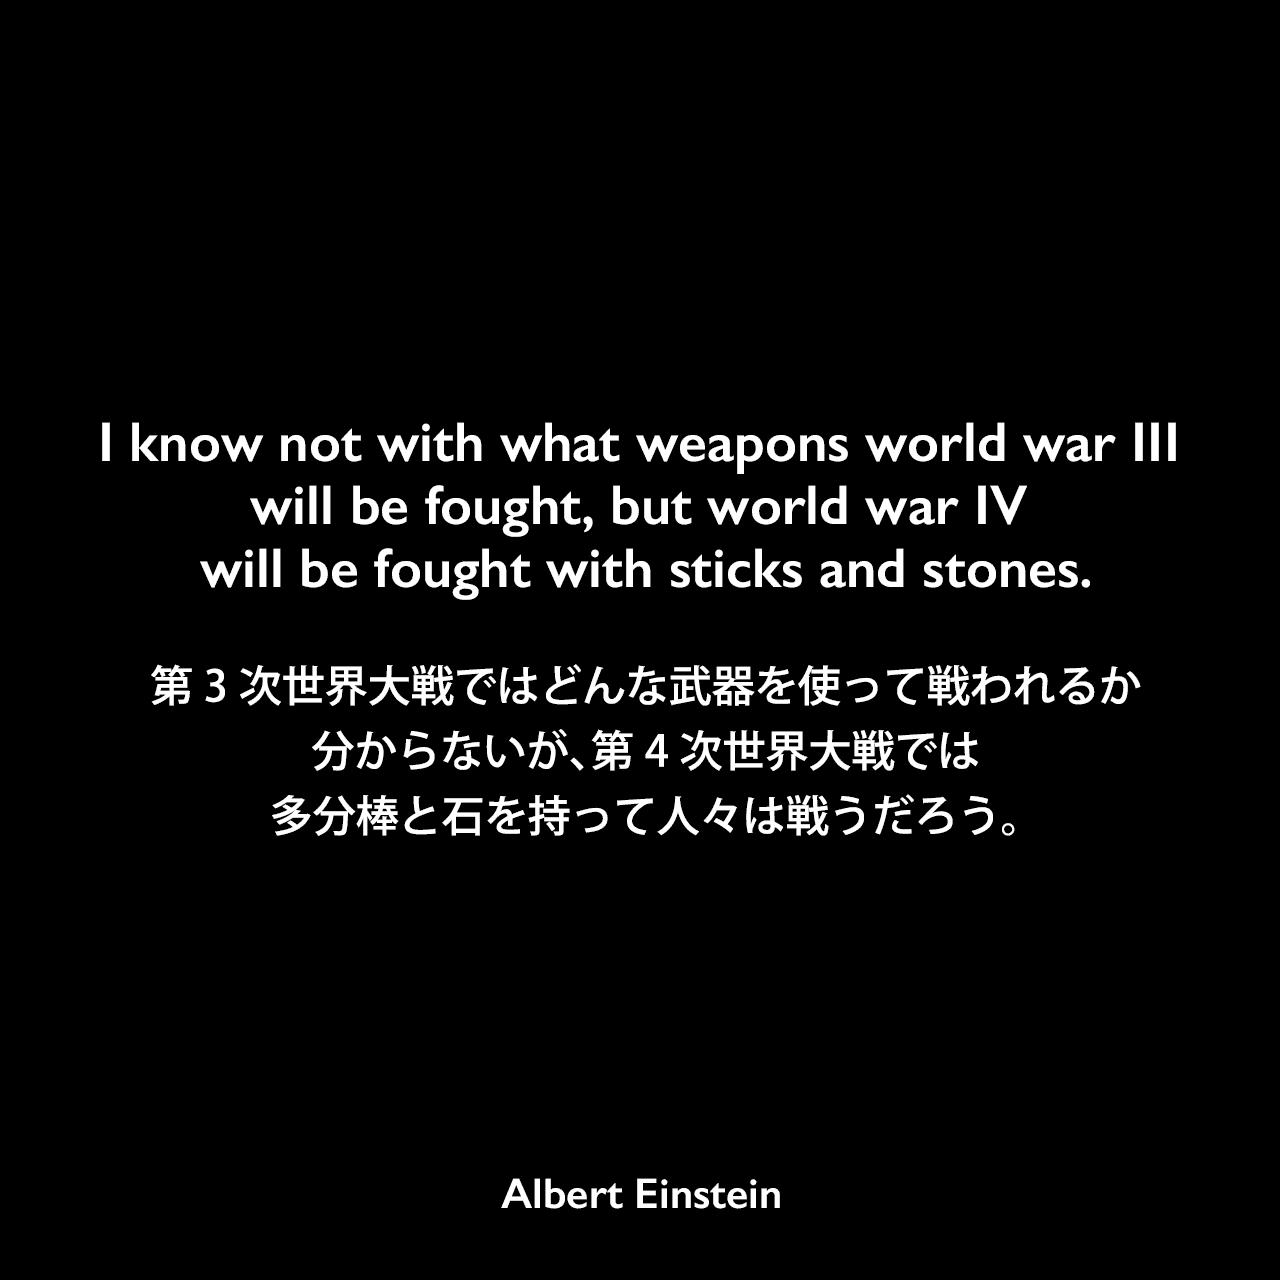 I know not with what weapons world war iii will be fought, but world war iv will be fought with sticks and stones.第3次世界大戦ではどんな武器を使って戦われるか分からないが、第4次世界大戦では、多分棒と石を持って人々は戦うだろう。- Alfred Wernerとのインタビュー(1949年)でAlbert Einstein